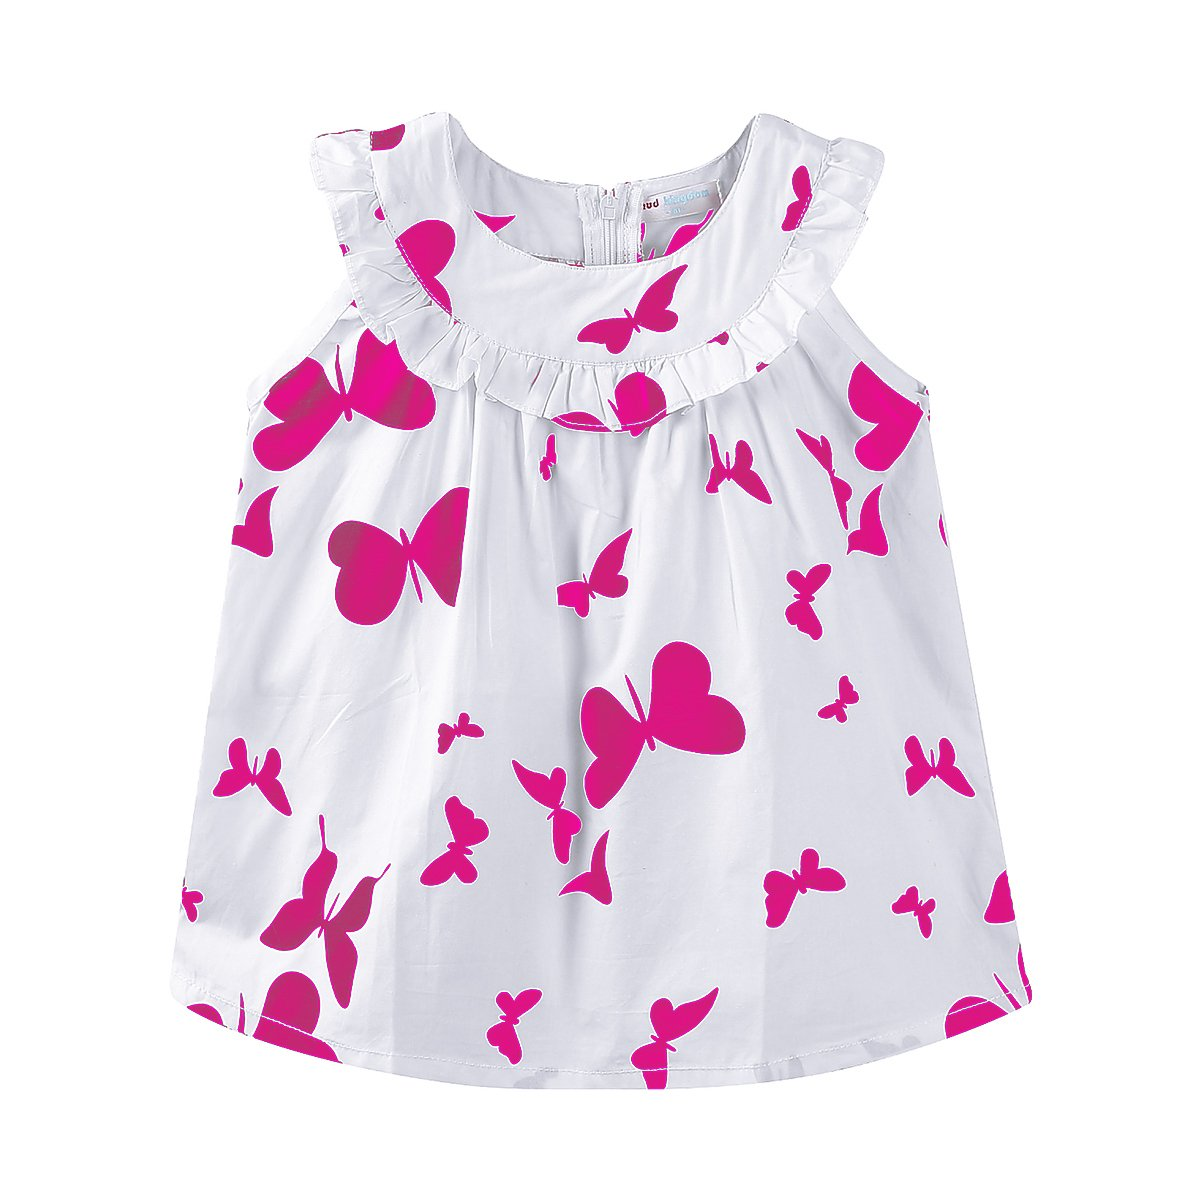 Mud Kingdom Little Girls Dresses 5 Butterfly Sleevelss Rose Red